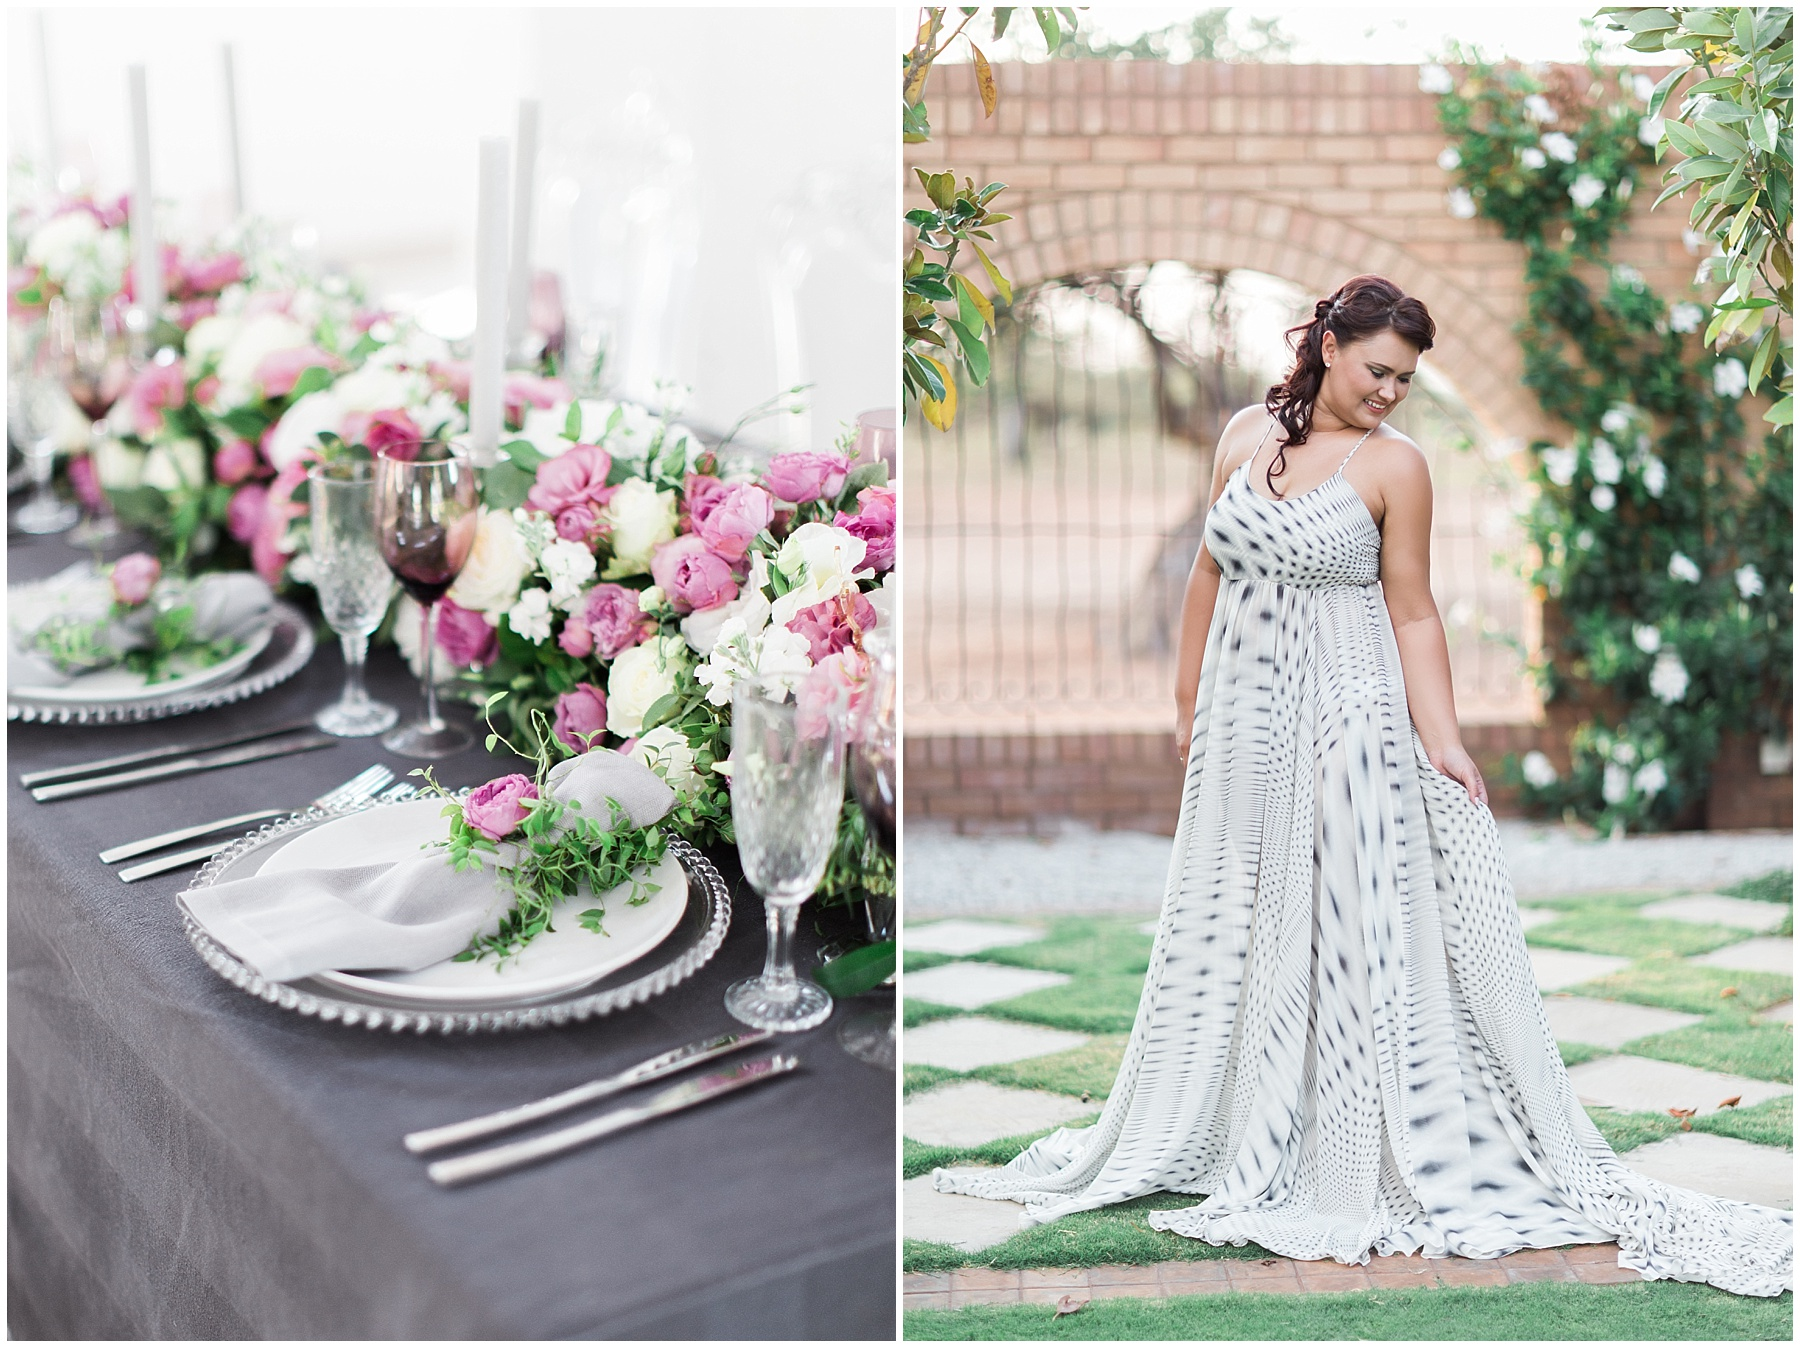 AliciaLandman_JoleneandZander_Wedding_The Pretty Blog_0404.jpg